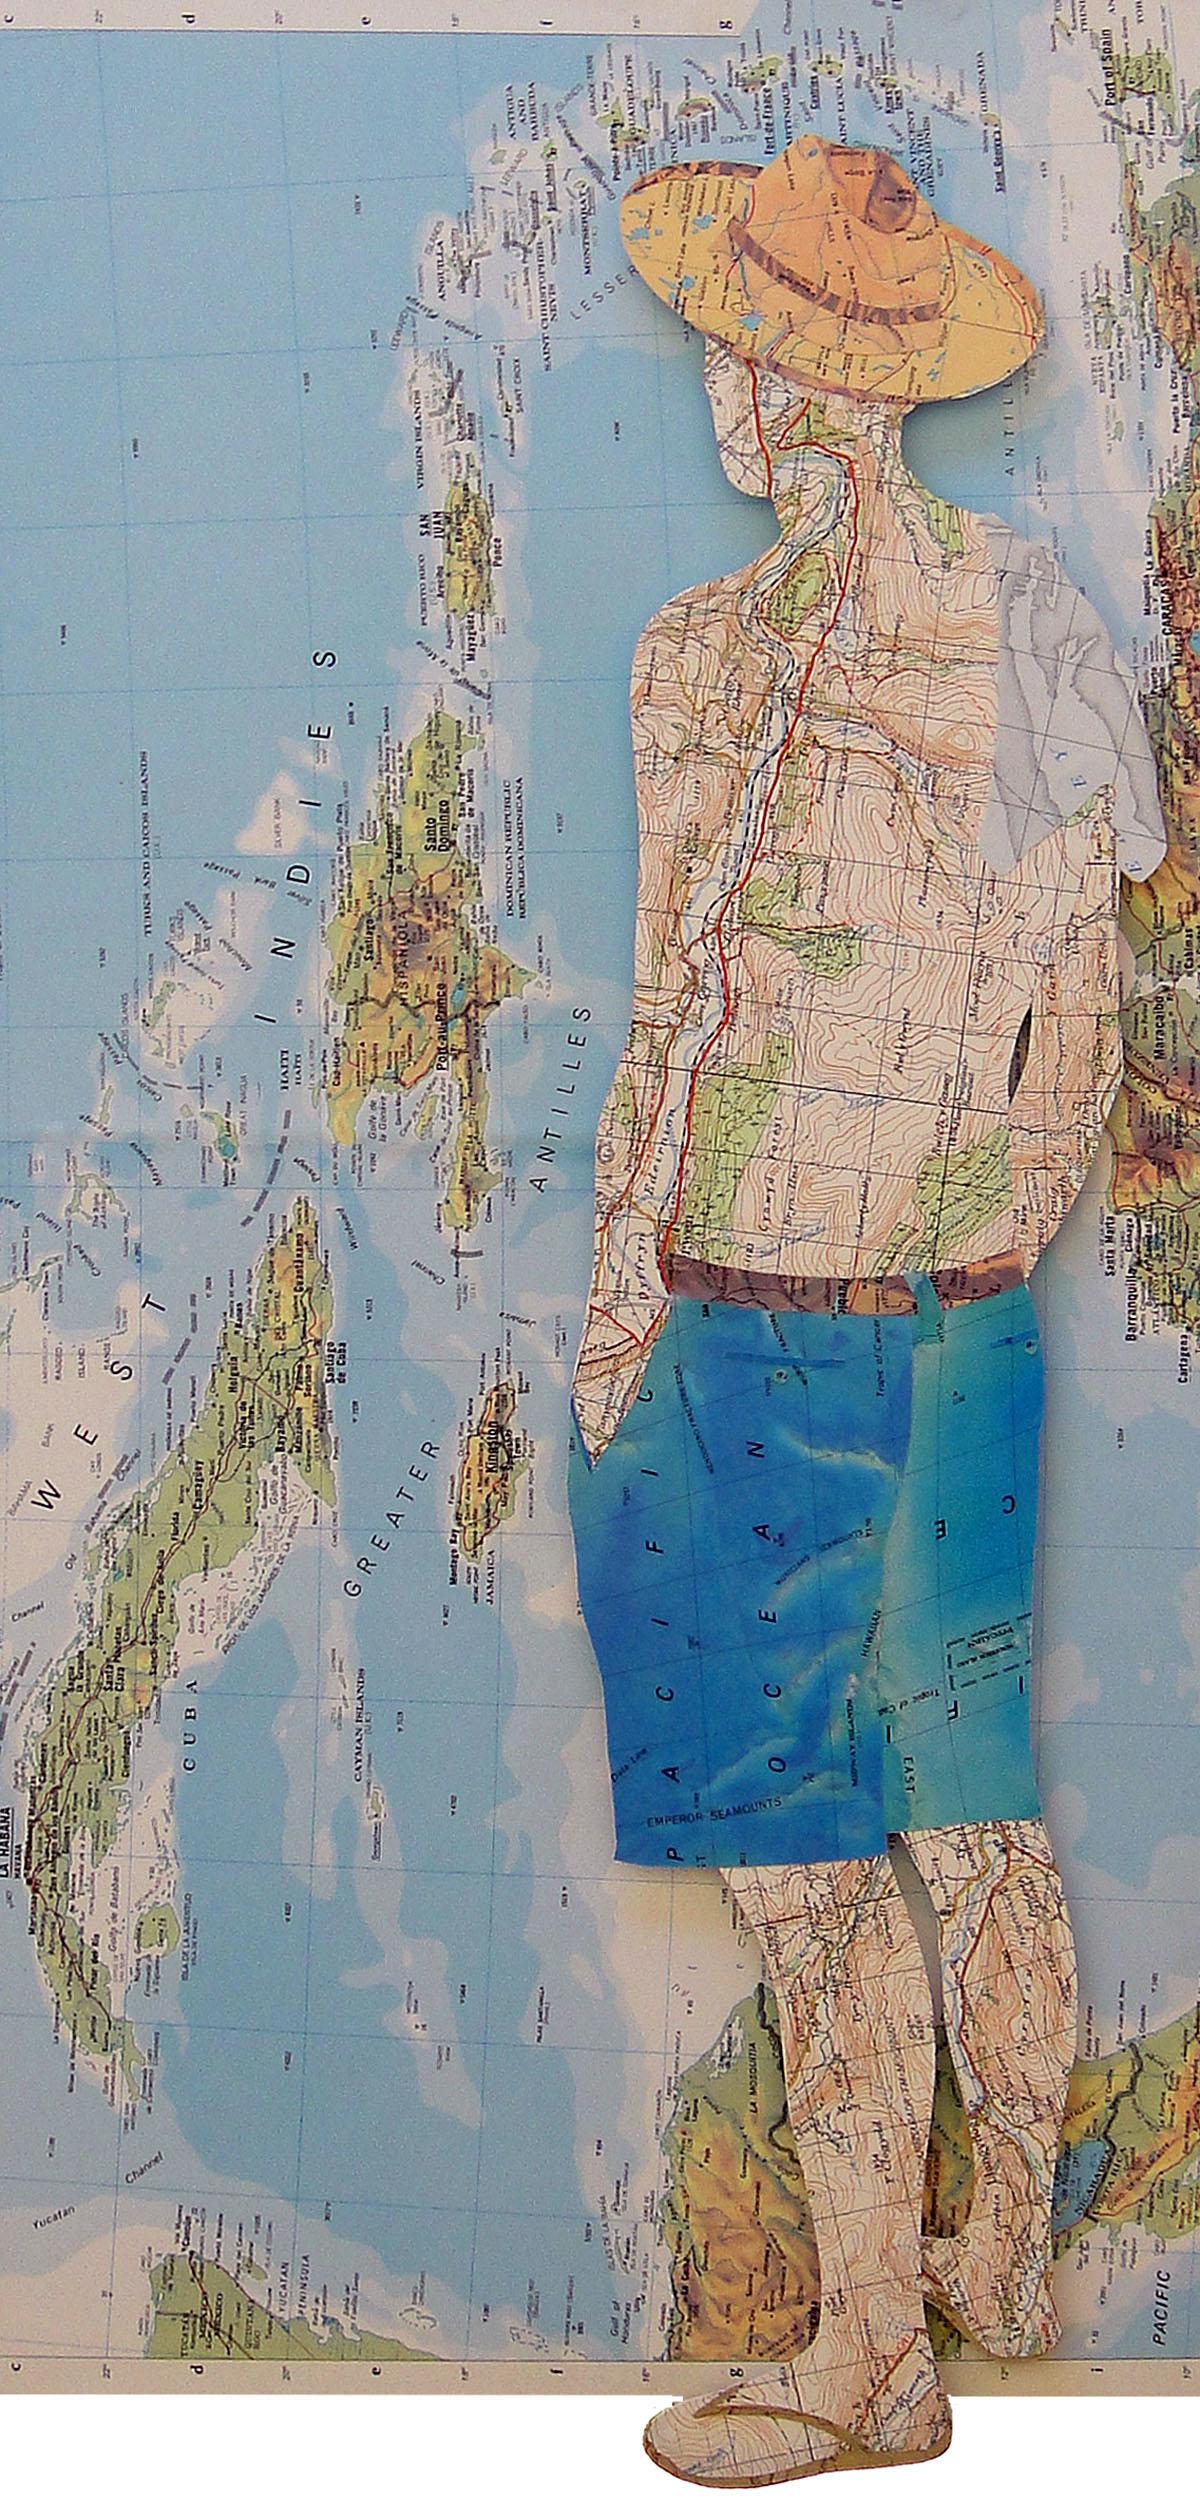 Collage using old maps: La Habana (2015)